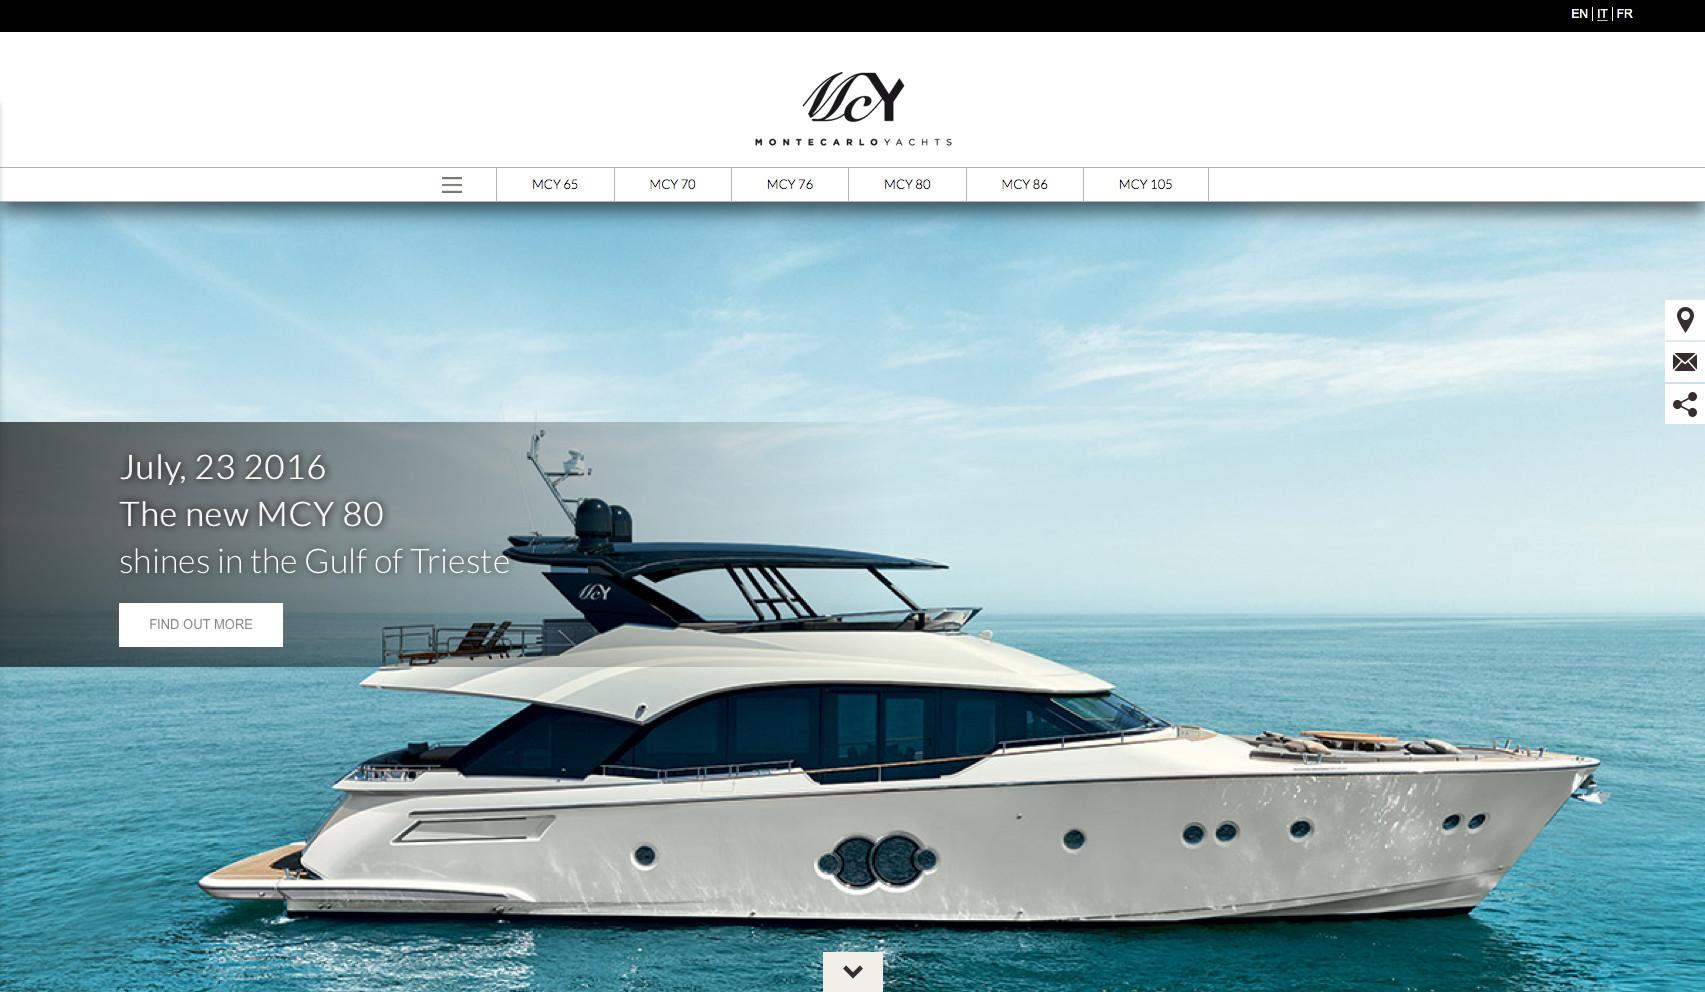 BmTec Montecarlo Yachts